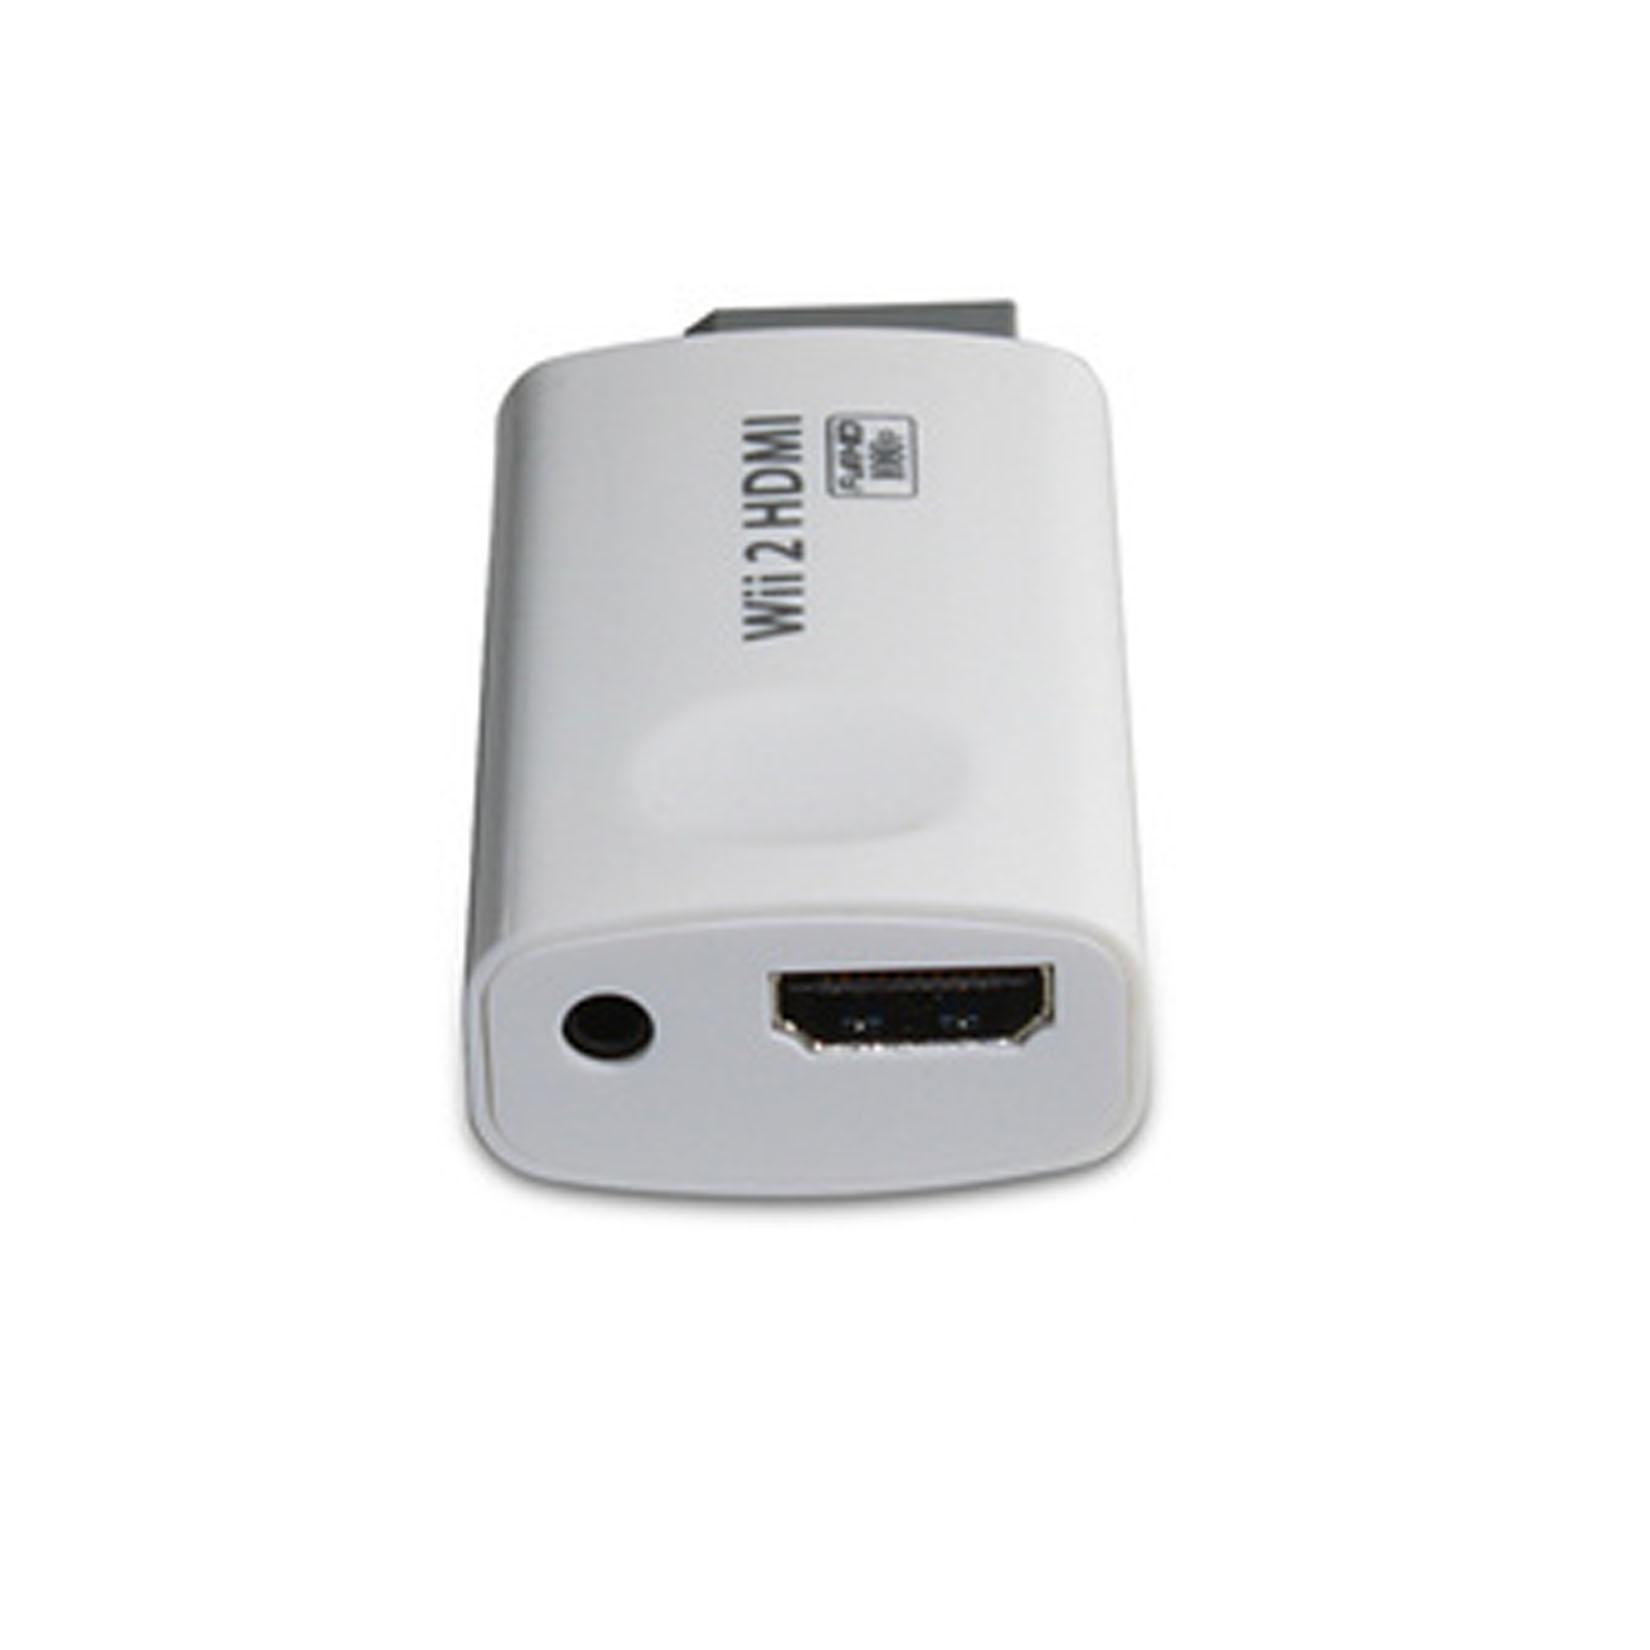 wii vers hdmi audio vid o adaptateur convertisseur 720p 1080p hd sortie ebay. Black Bedroom Furniture Sets. Home Design Ideas